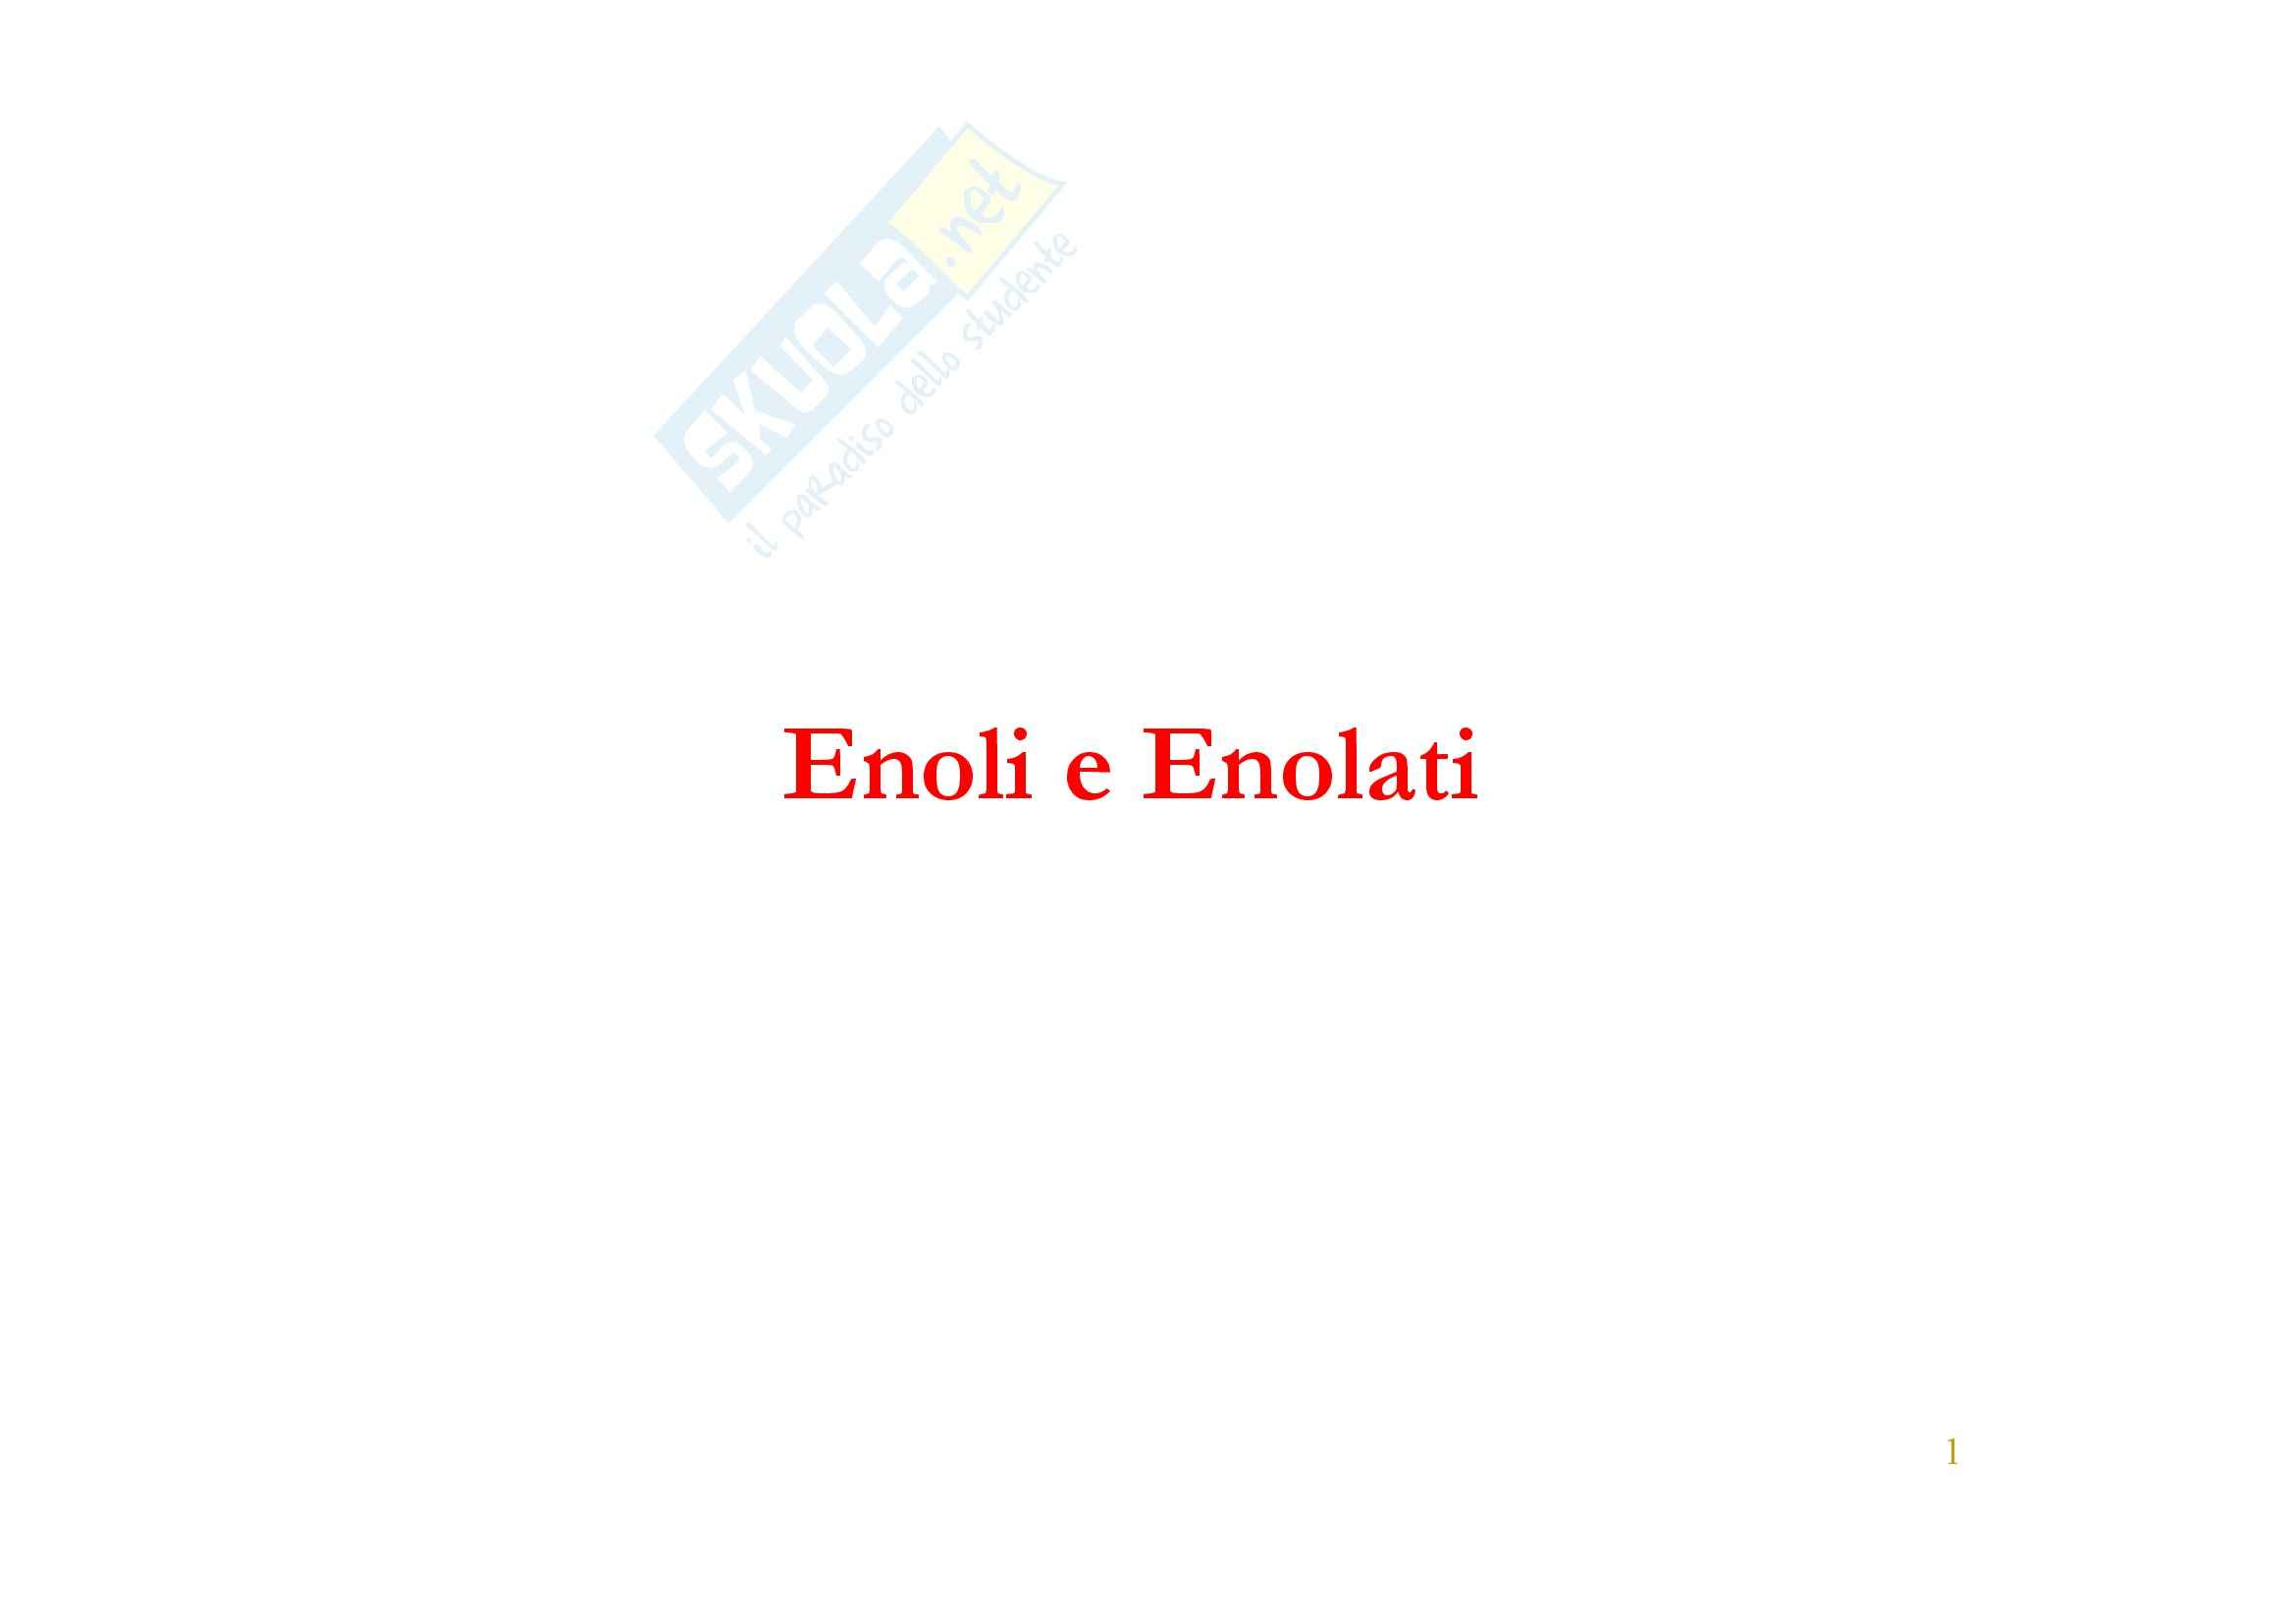 Chimica organica - enoli e enolati